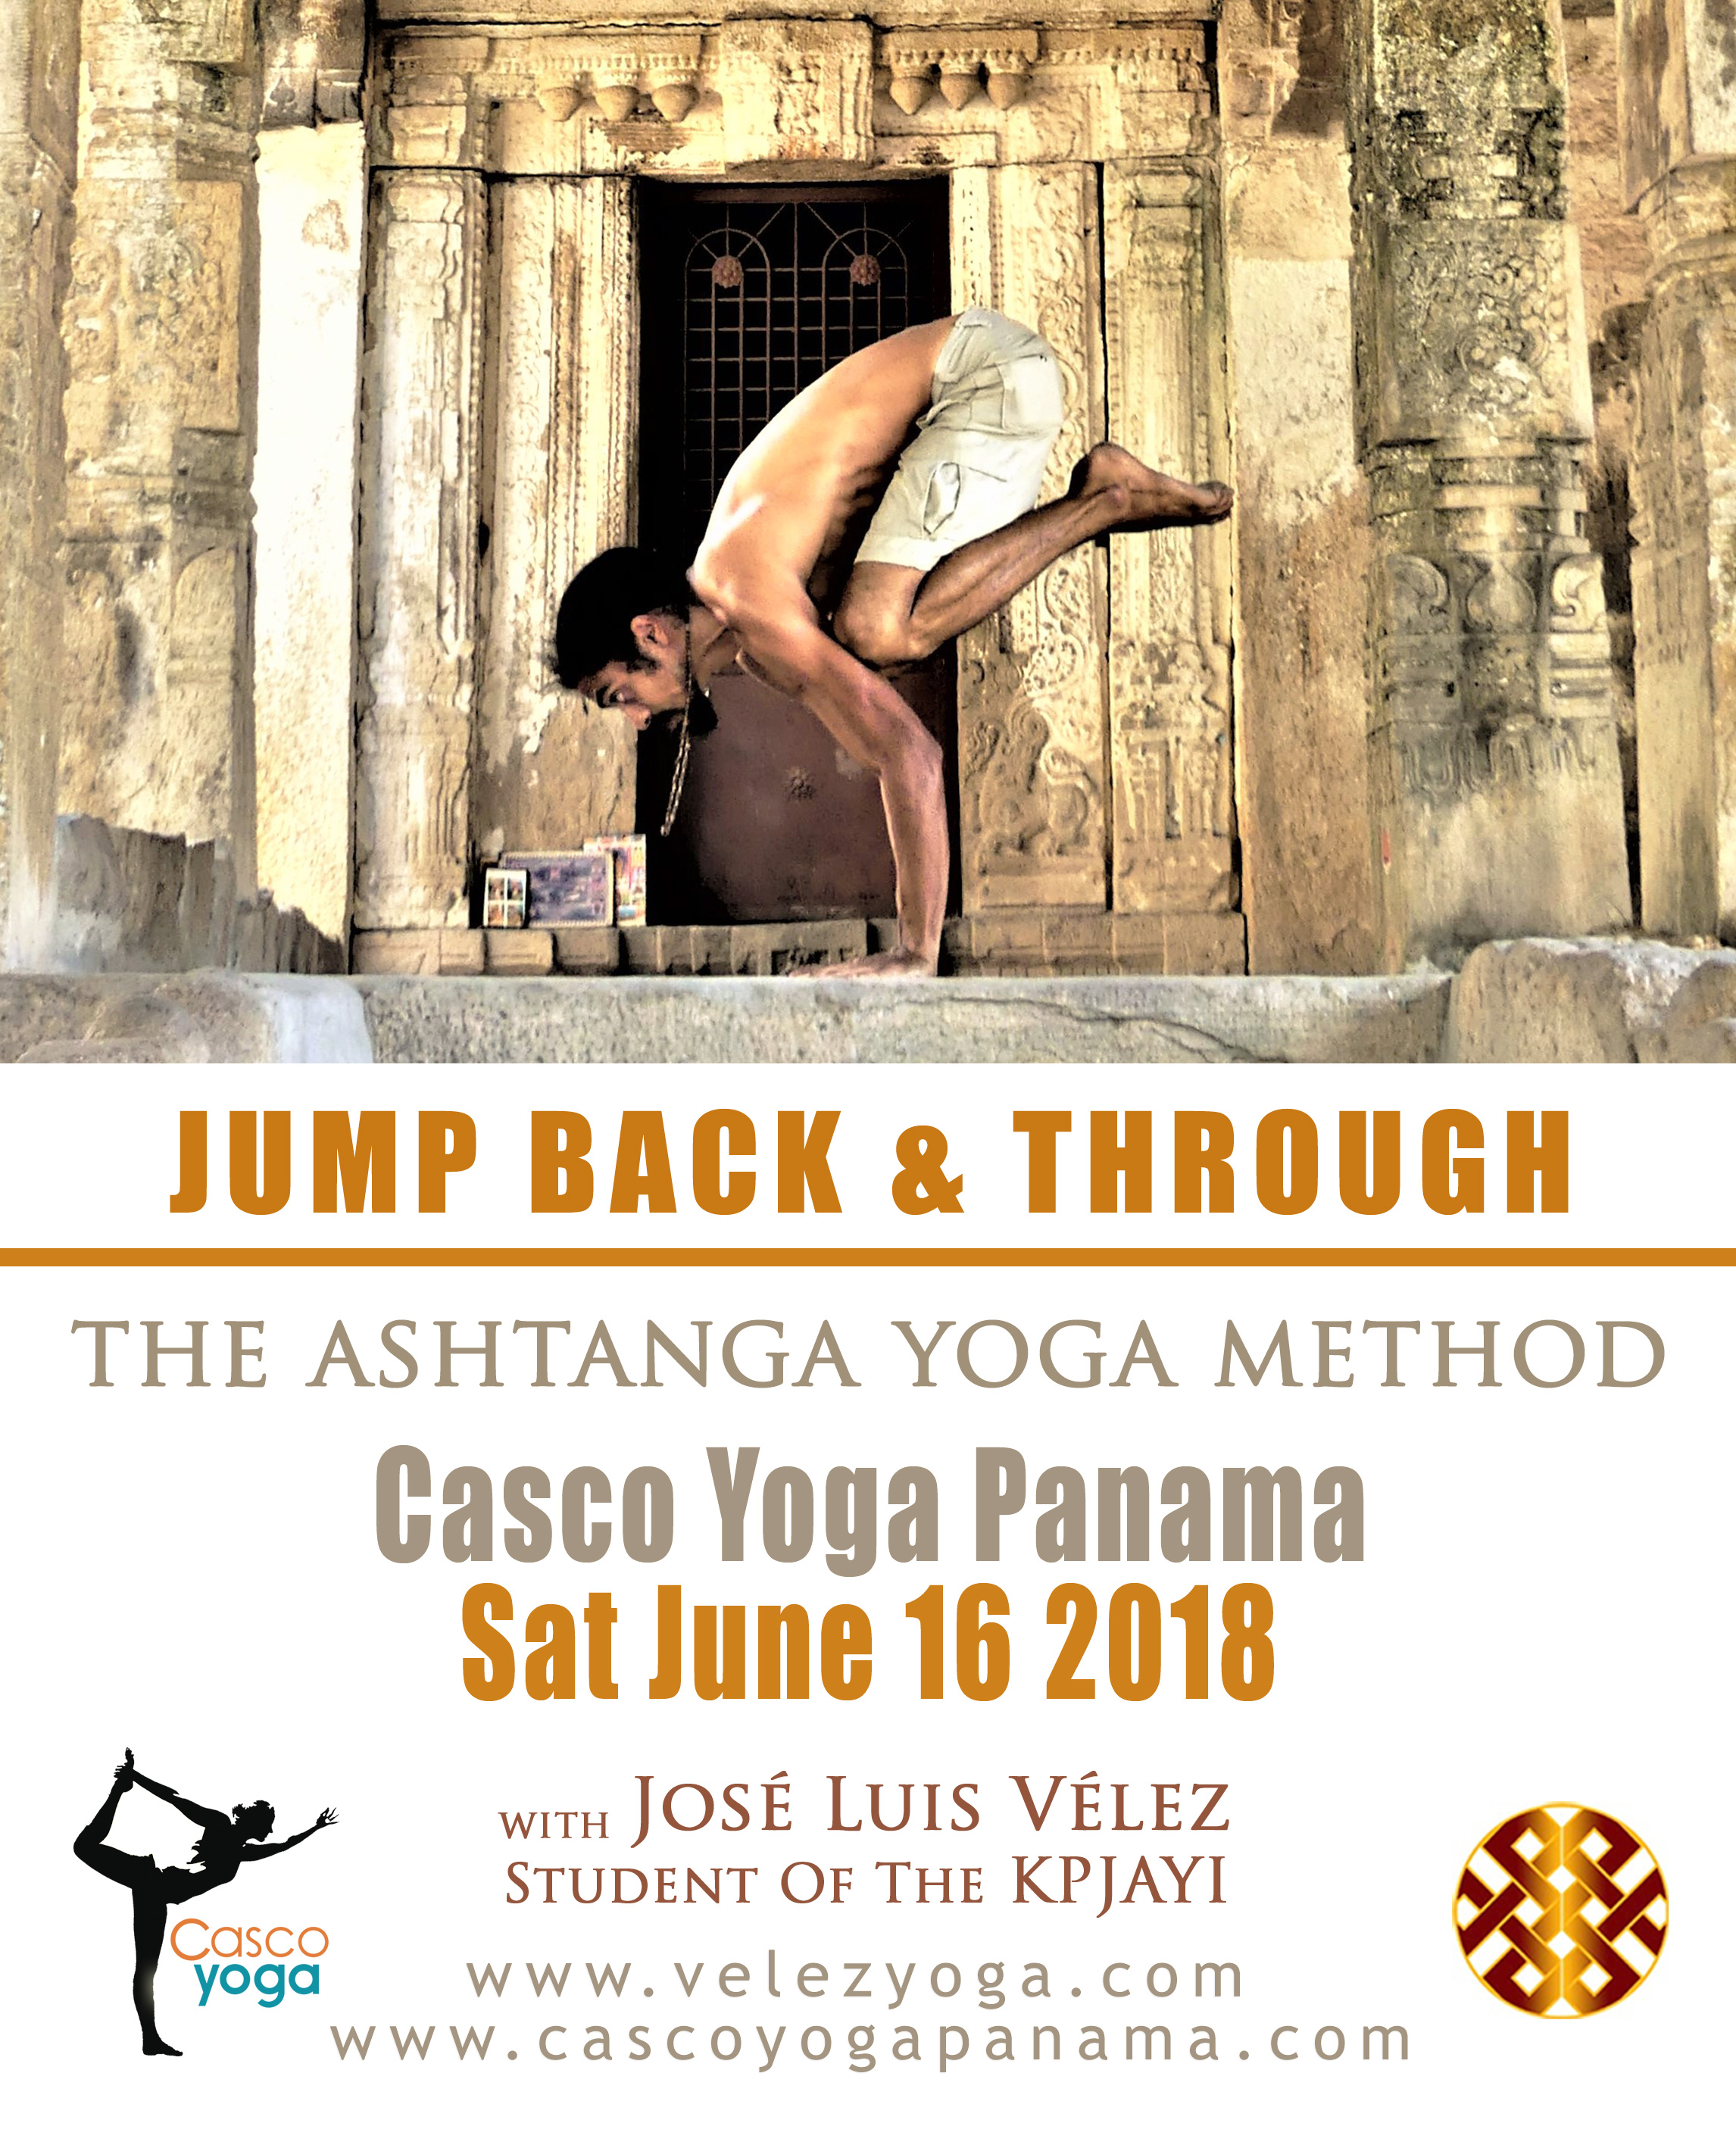 Jose Luis Velez, Casco Yoga Panama, Yoga Studio. Casco Viejo. Panama City, Panama. Yoga Panama. Ashtanga yoga panama. Vinyasa yoga panama. clases de yoga en panama. Casco Antiguo Panama. boutique yoga studio